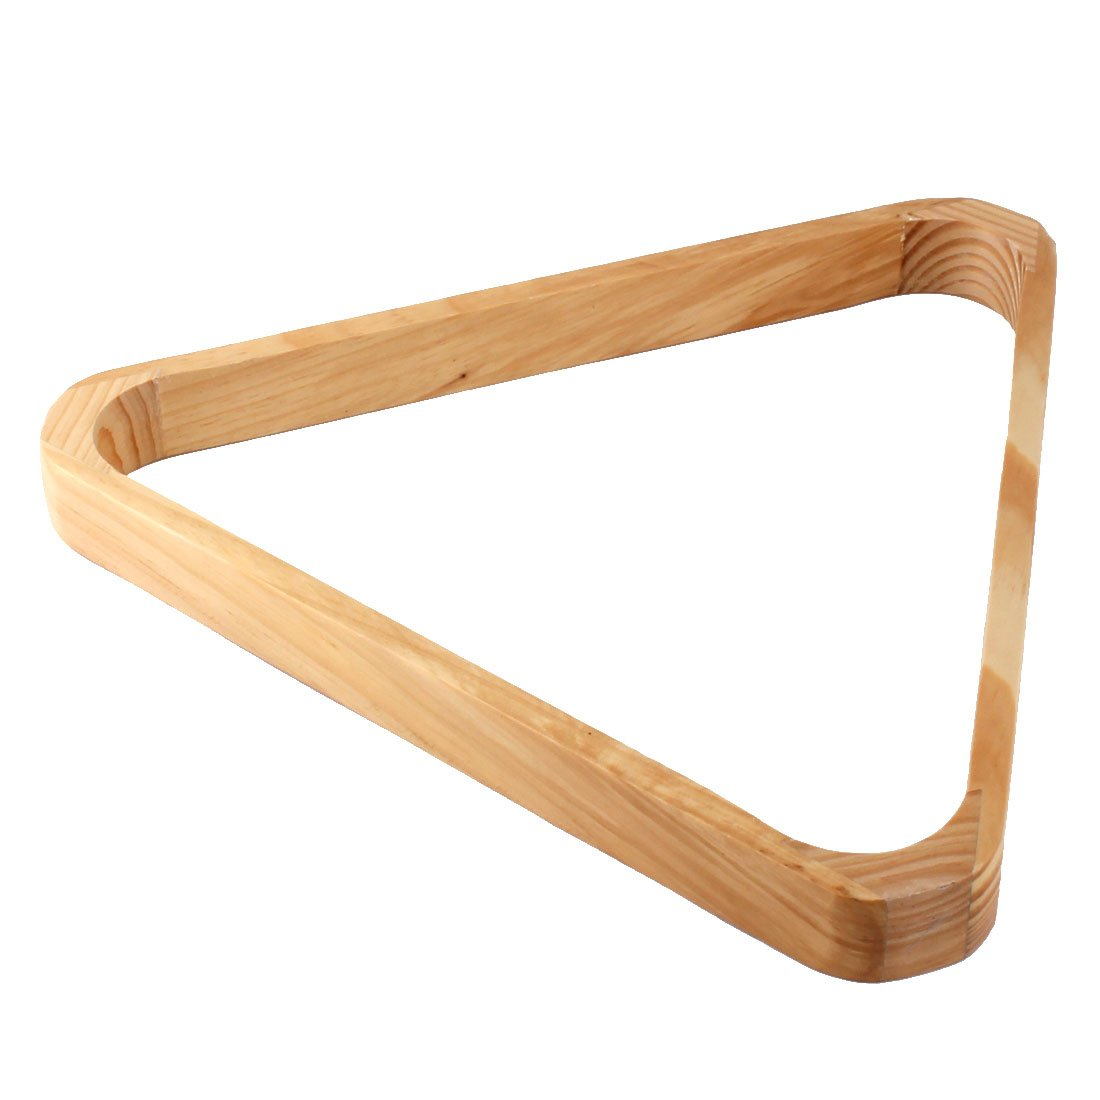 Sourcingmap Table Billard Billard 5.7 cm Balle Bois Accessoire Dia Triangle contenir